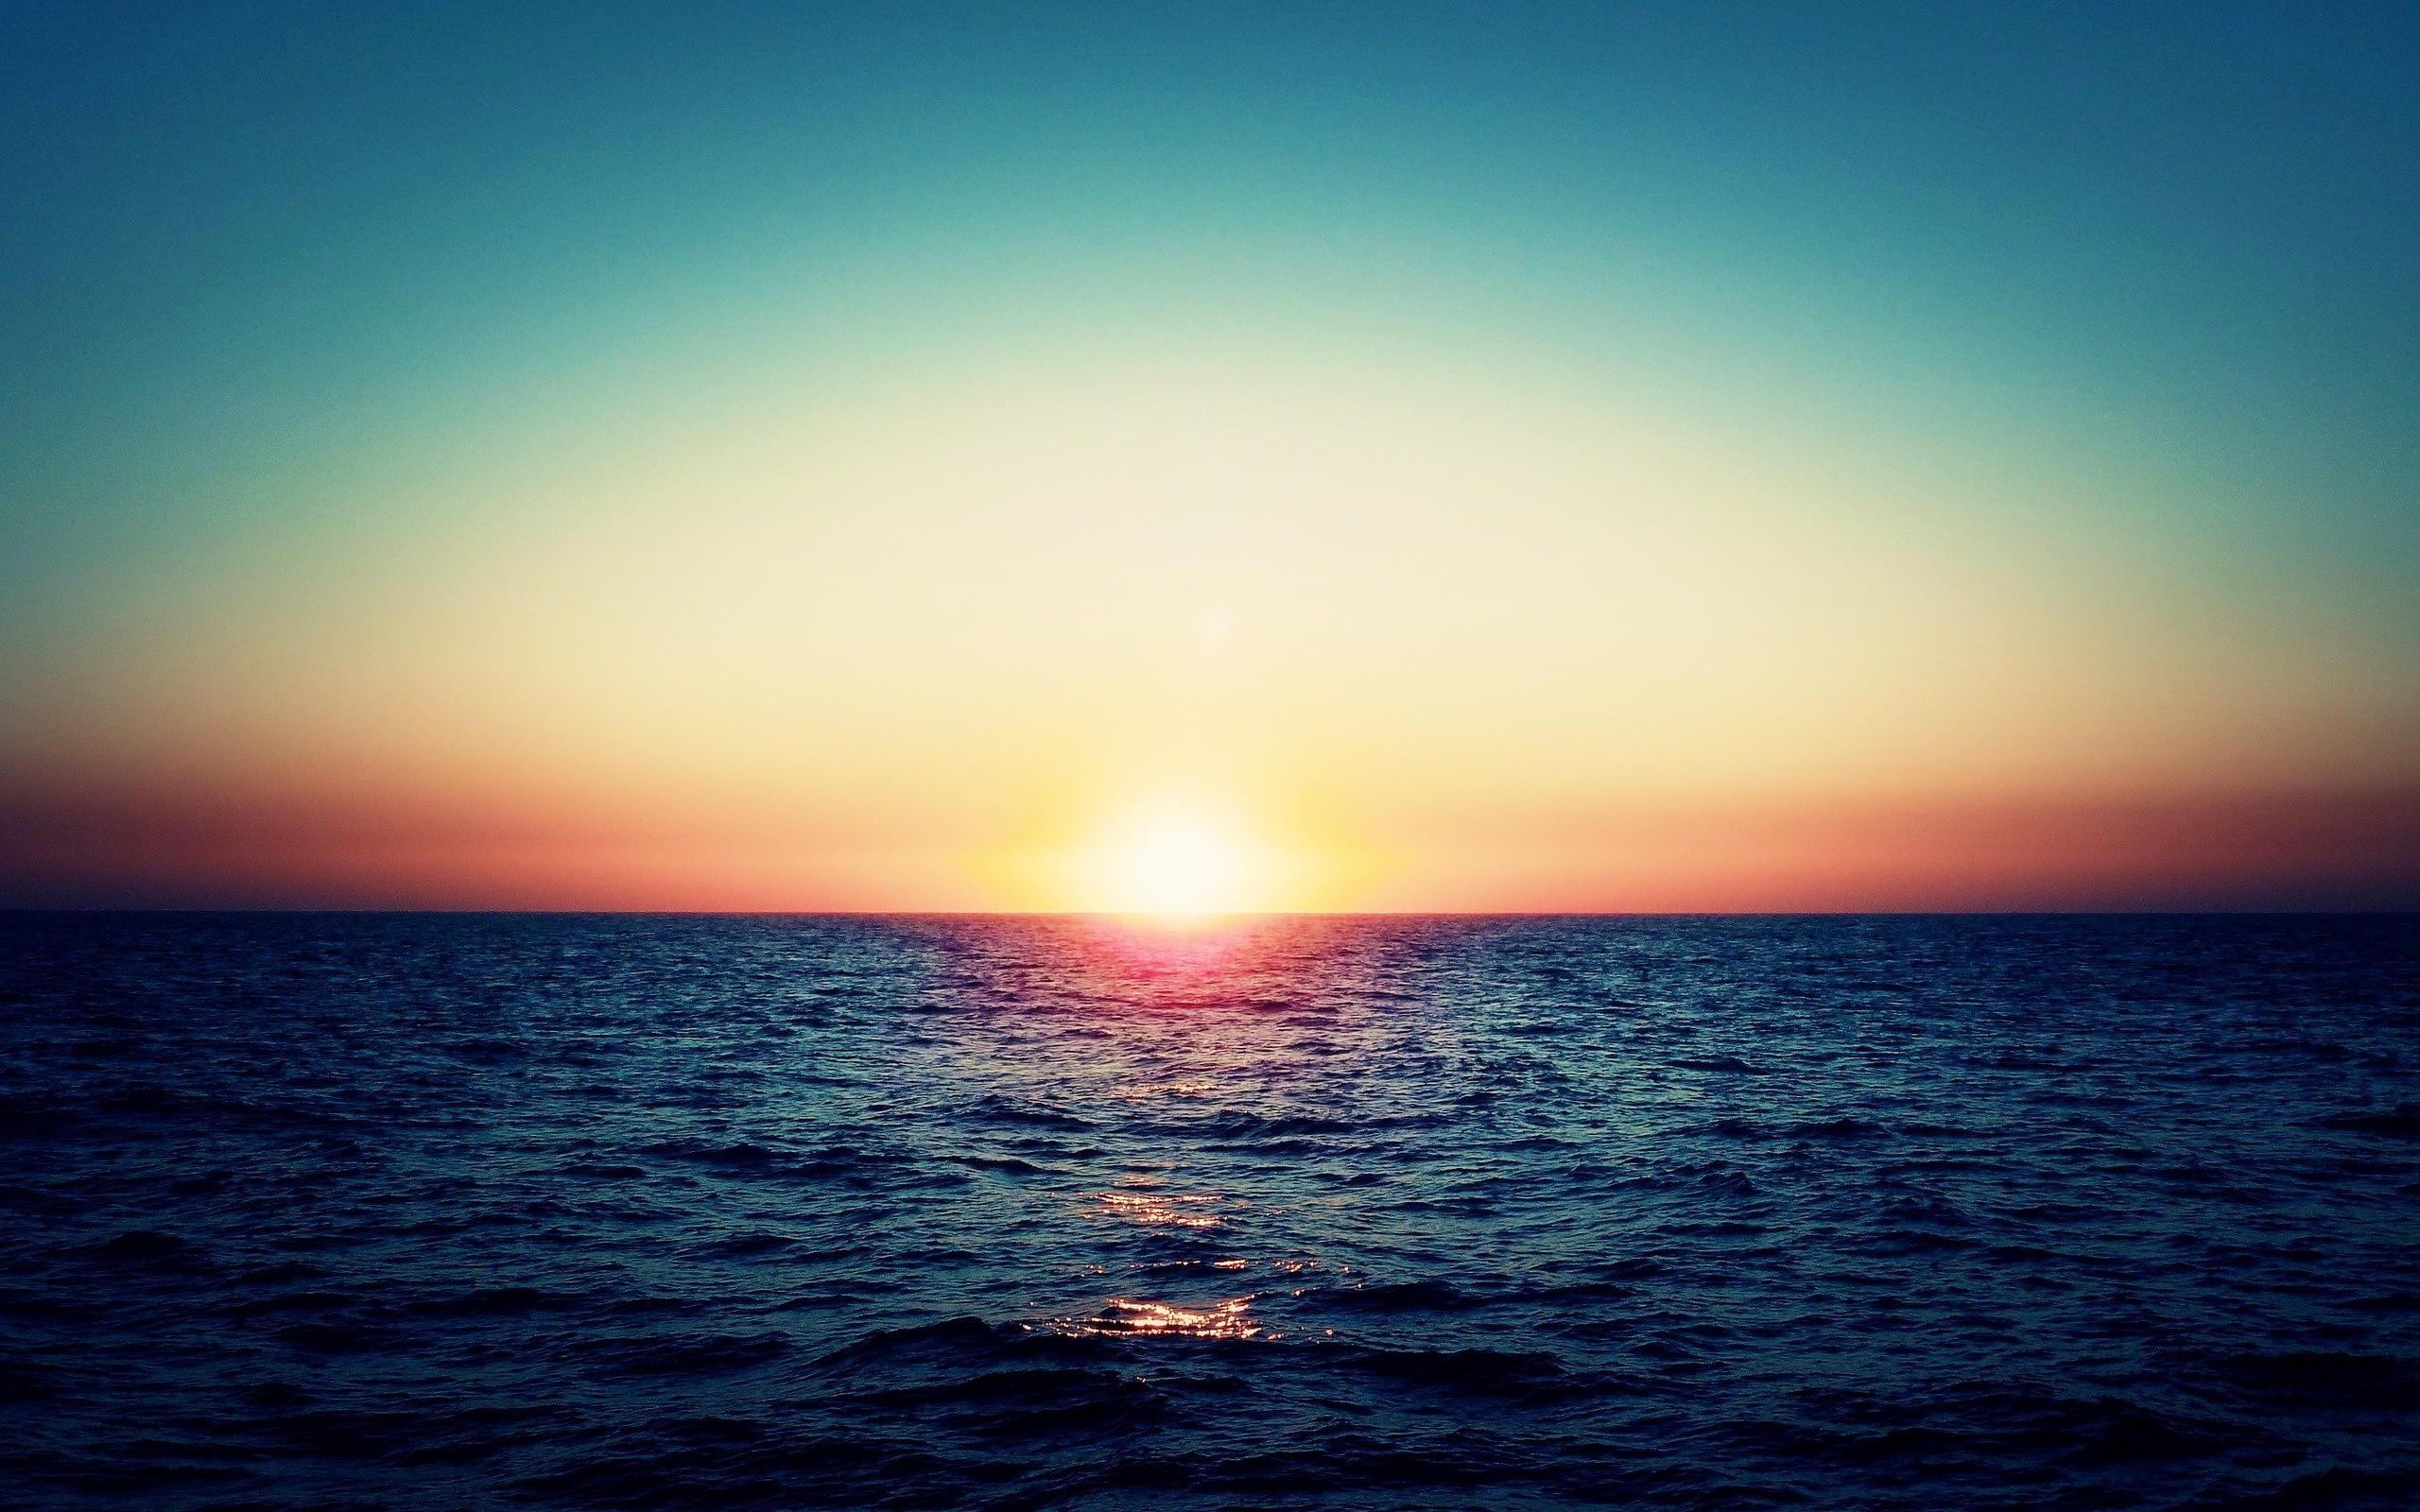 ocean-sunset-wallpapers-images.jpg